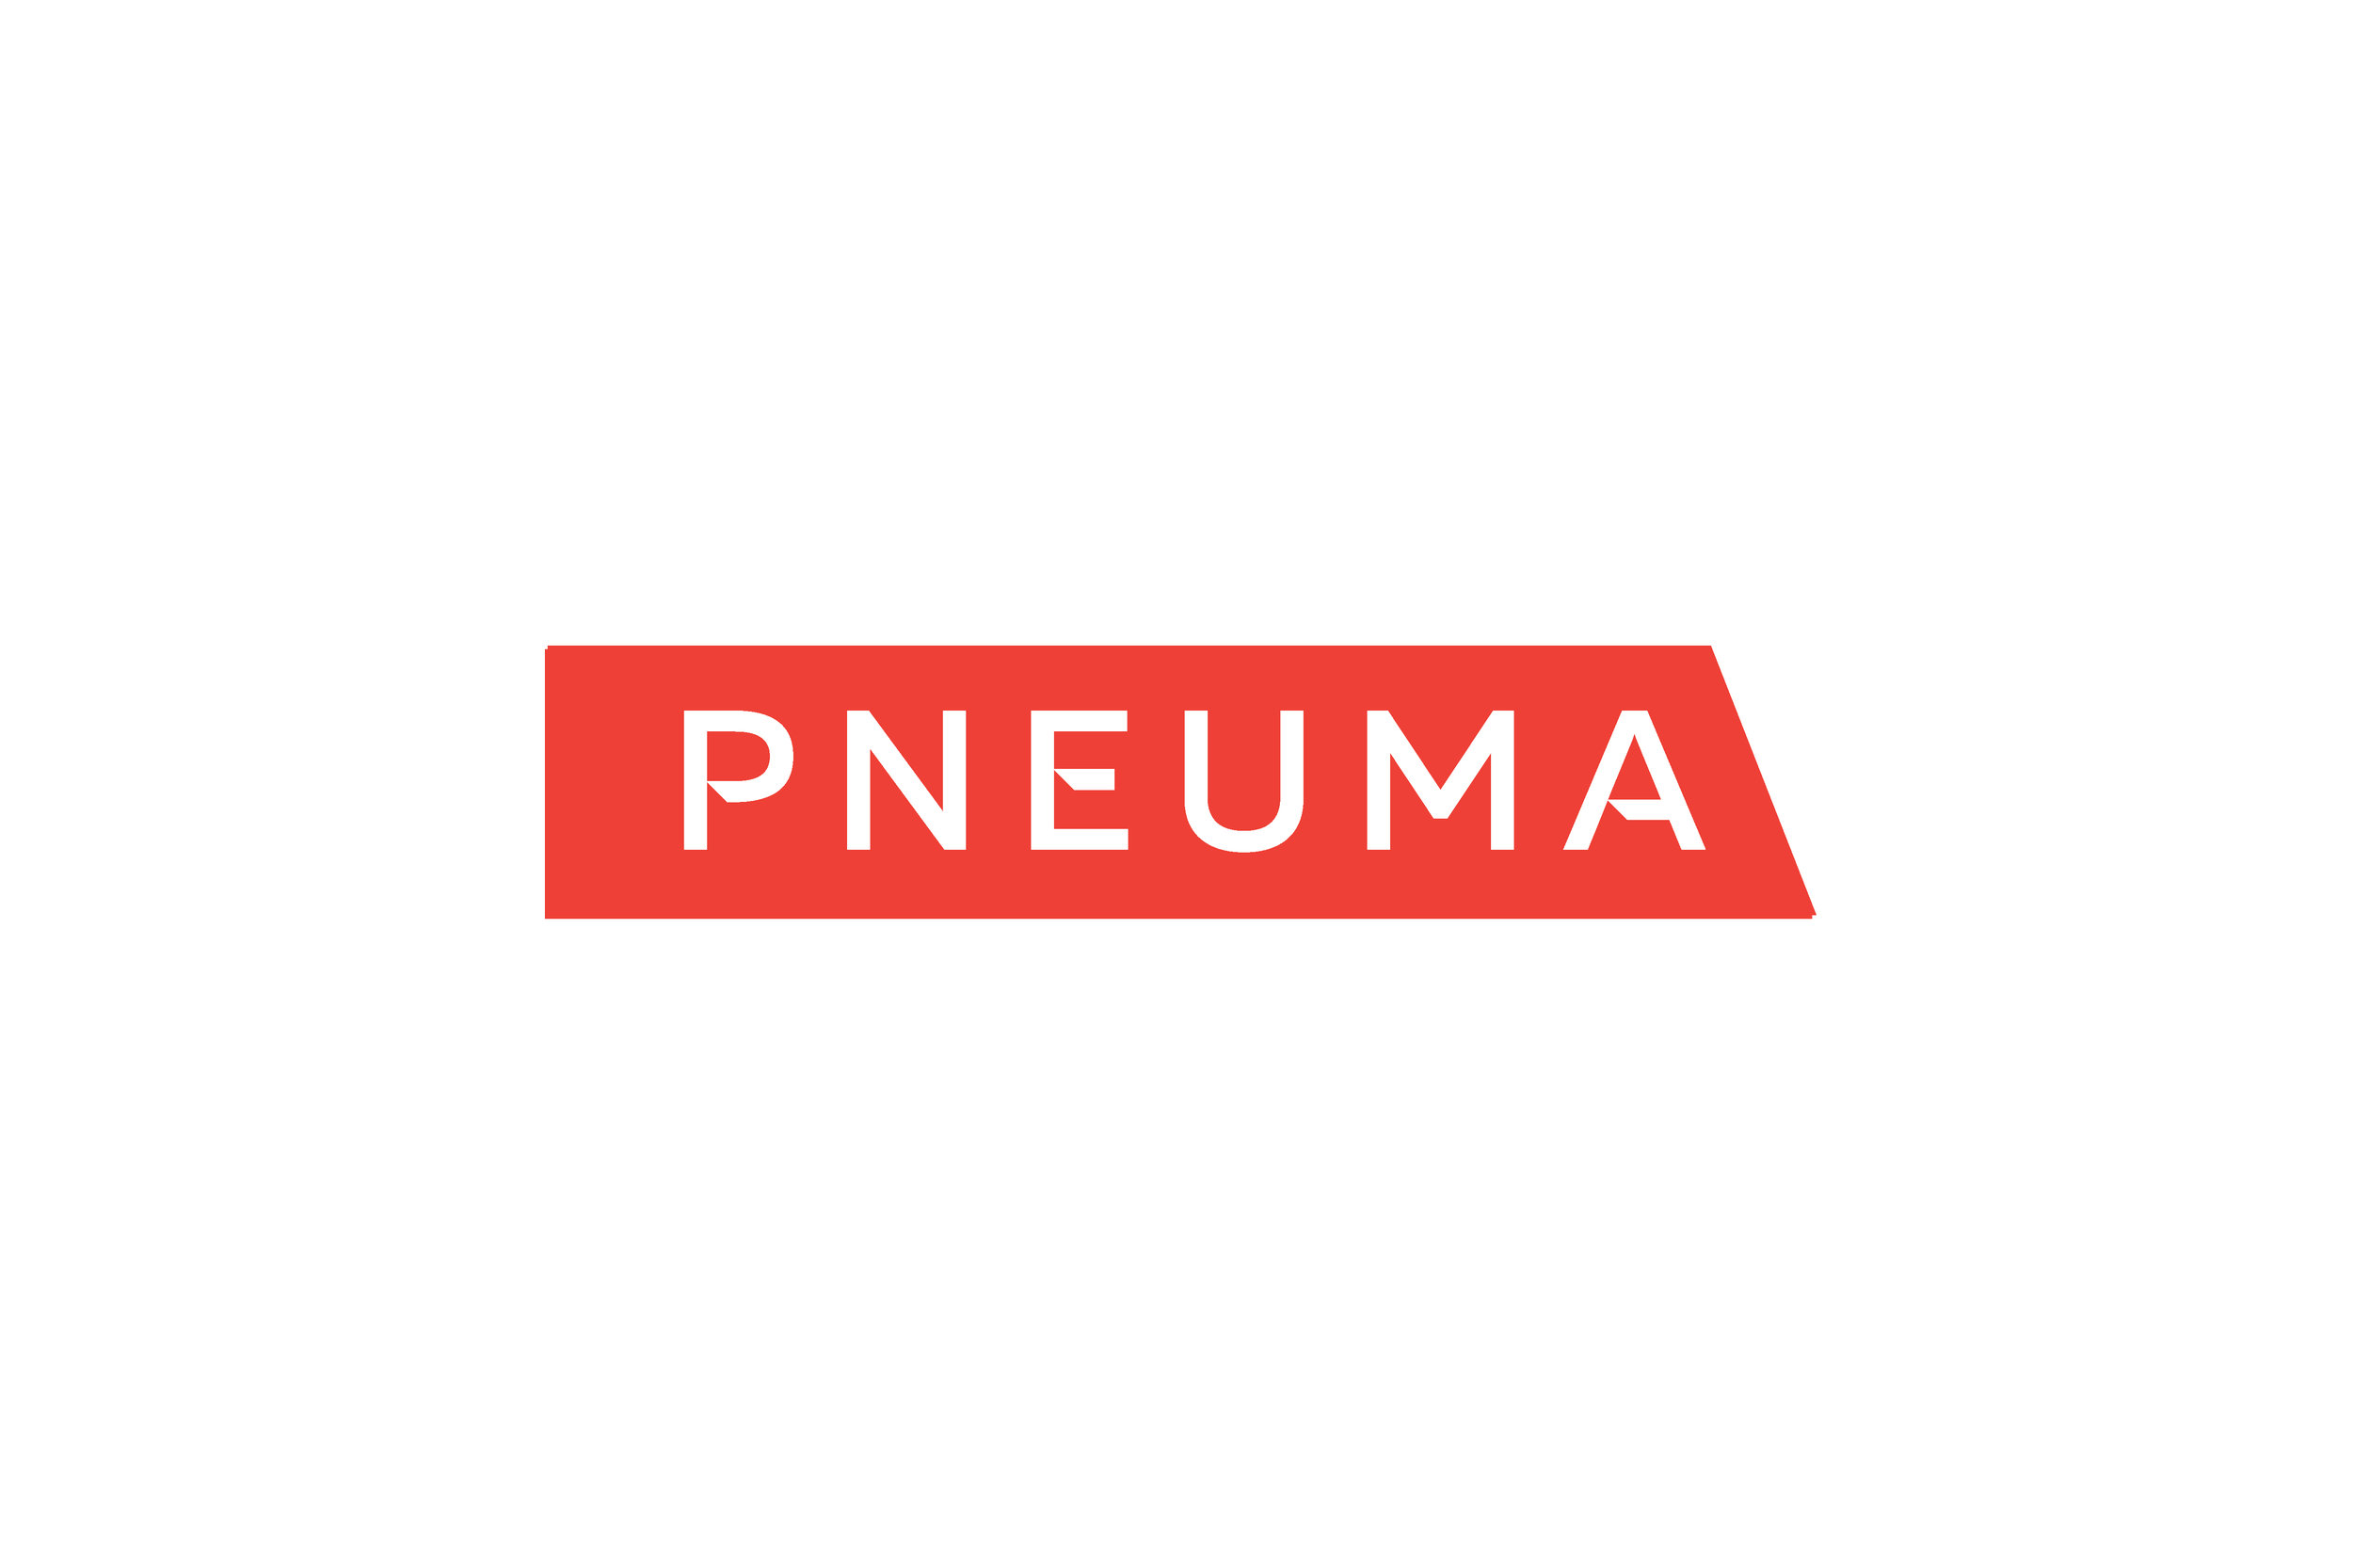 Pneuma3.jpg